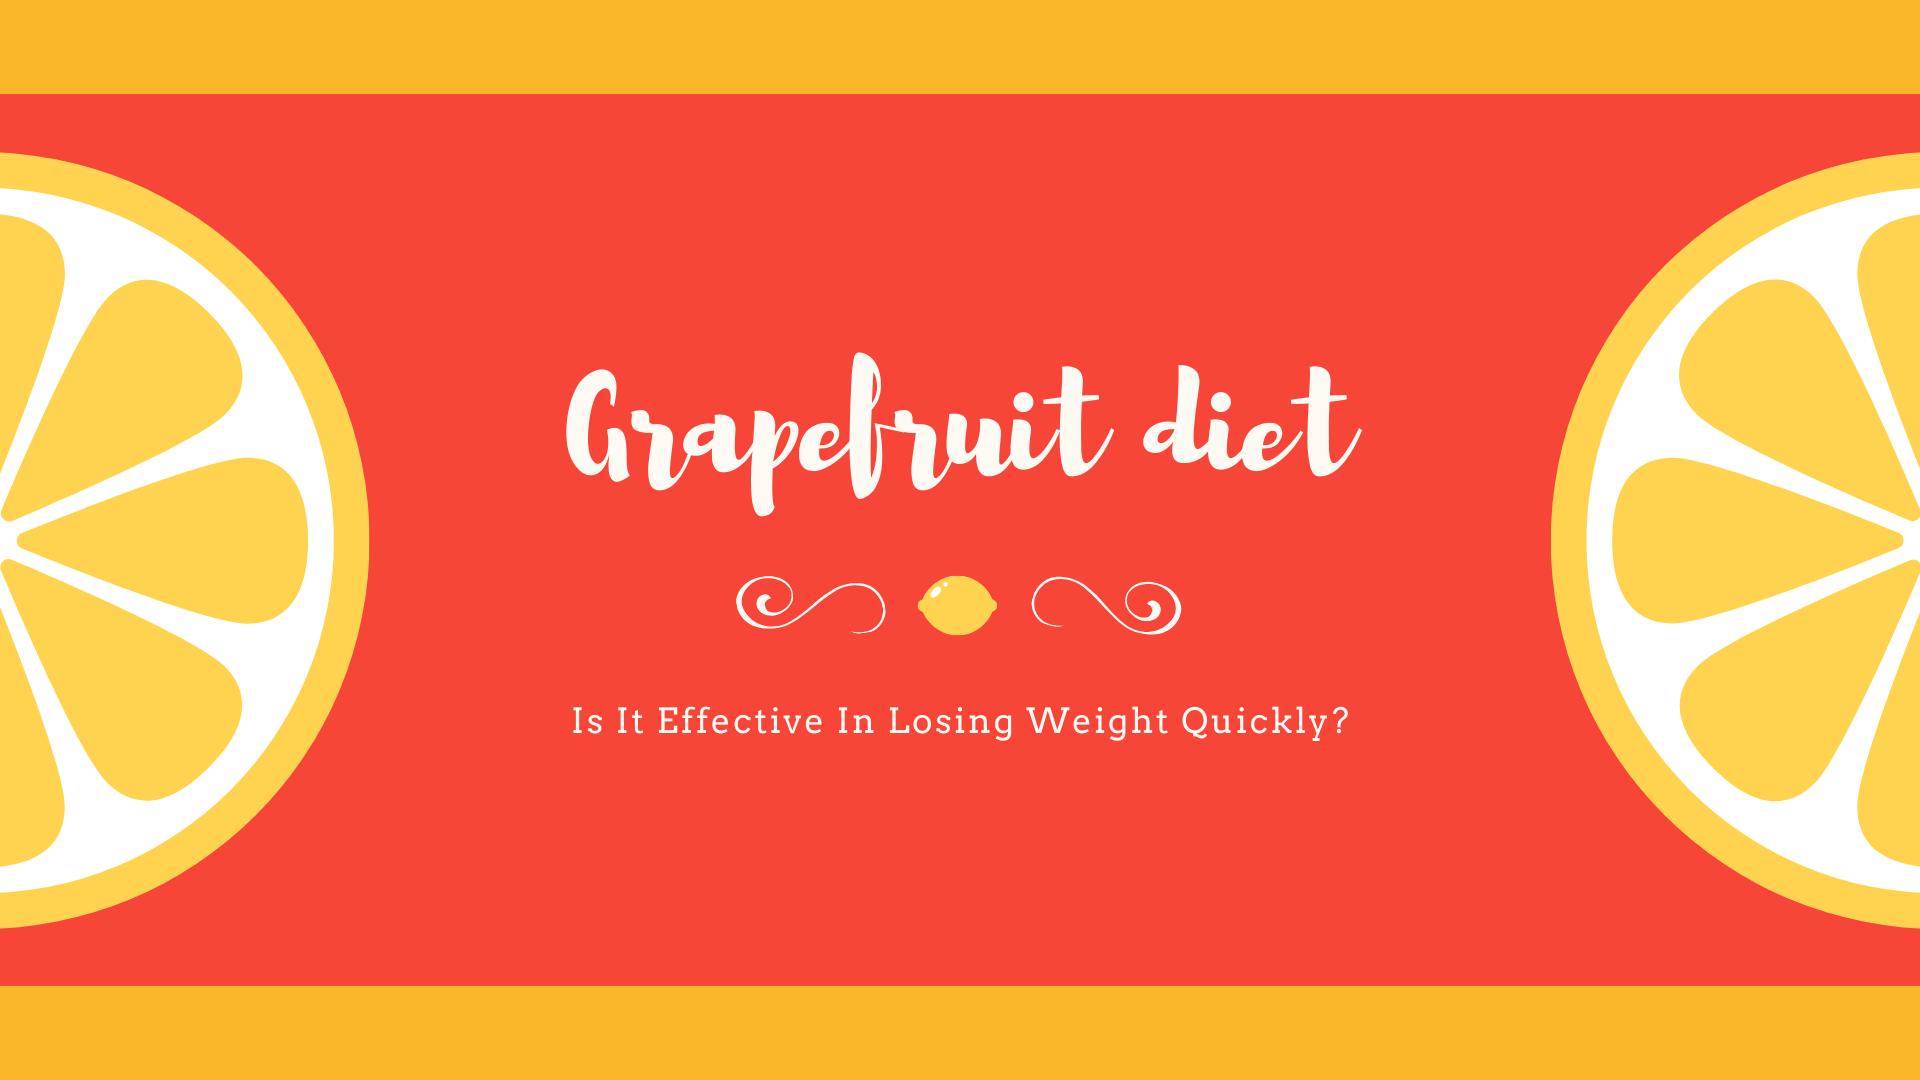 grapefruit diet study